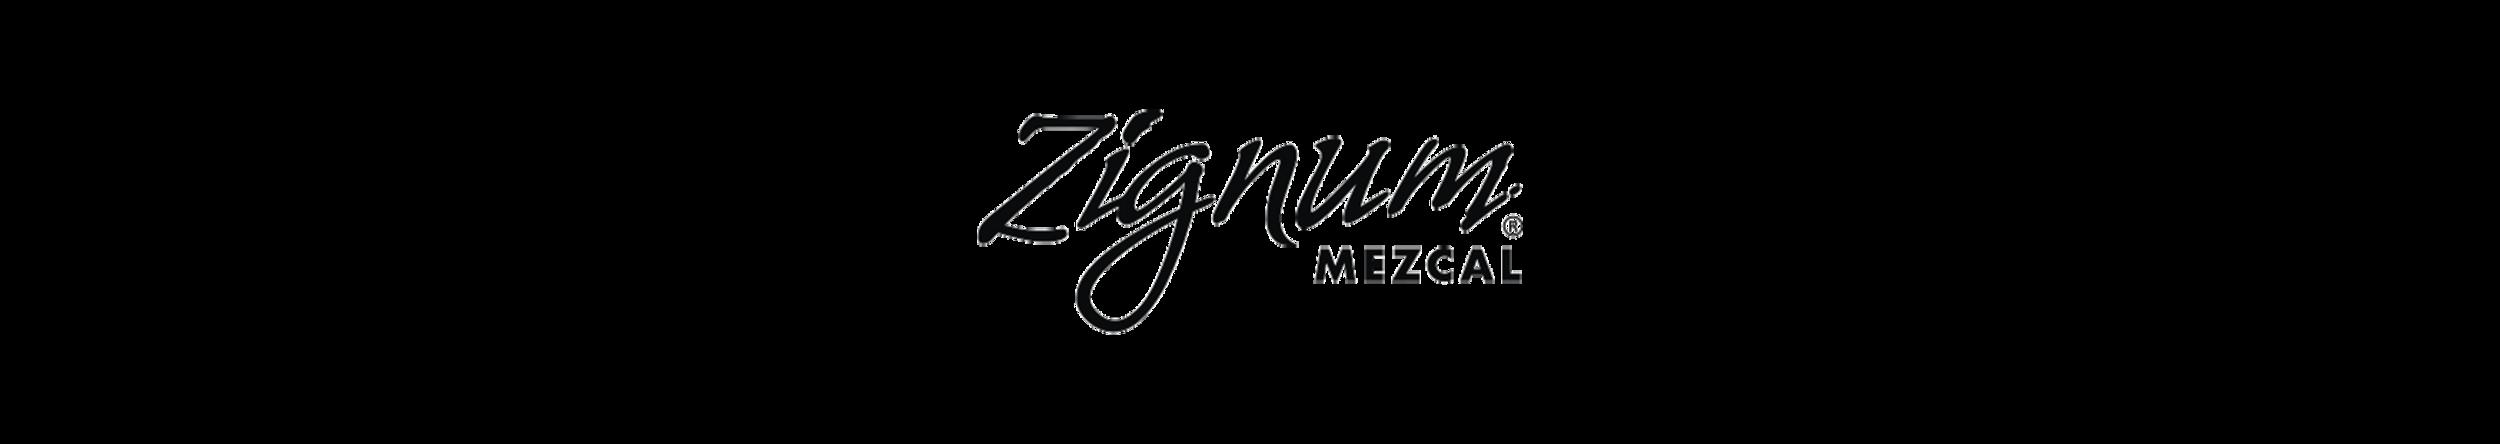 zignun_Banner_logo_web.png